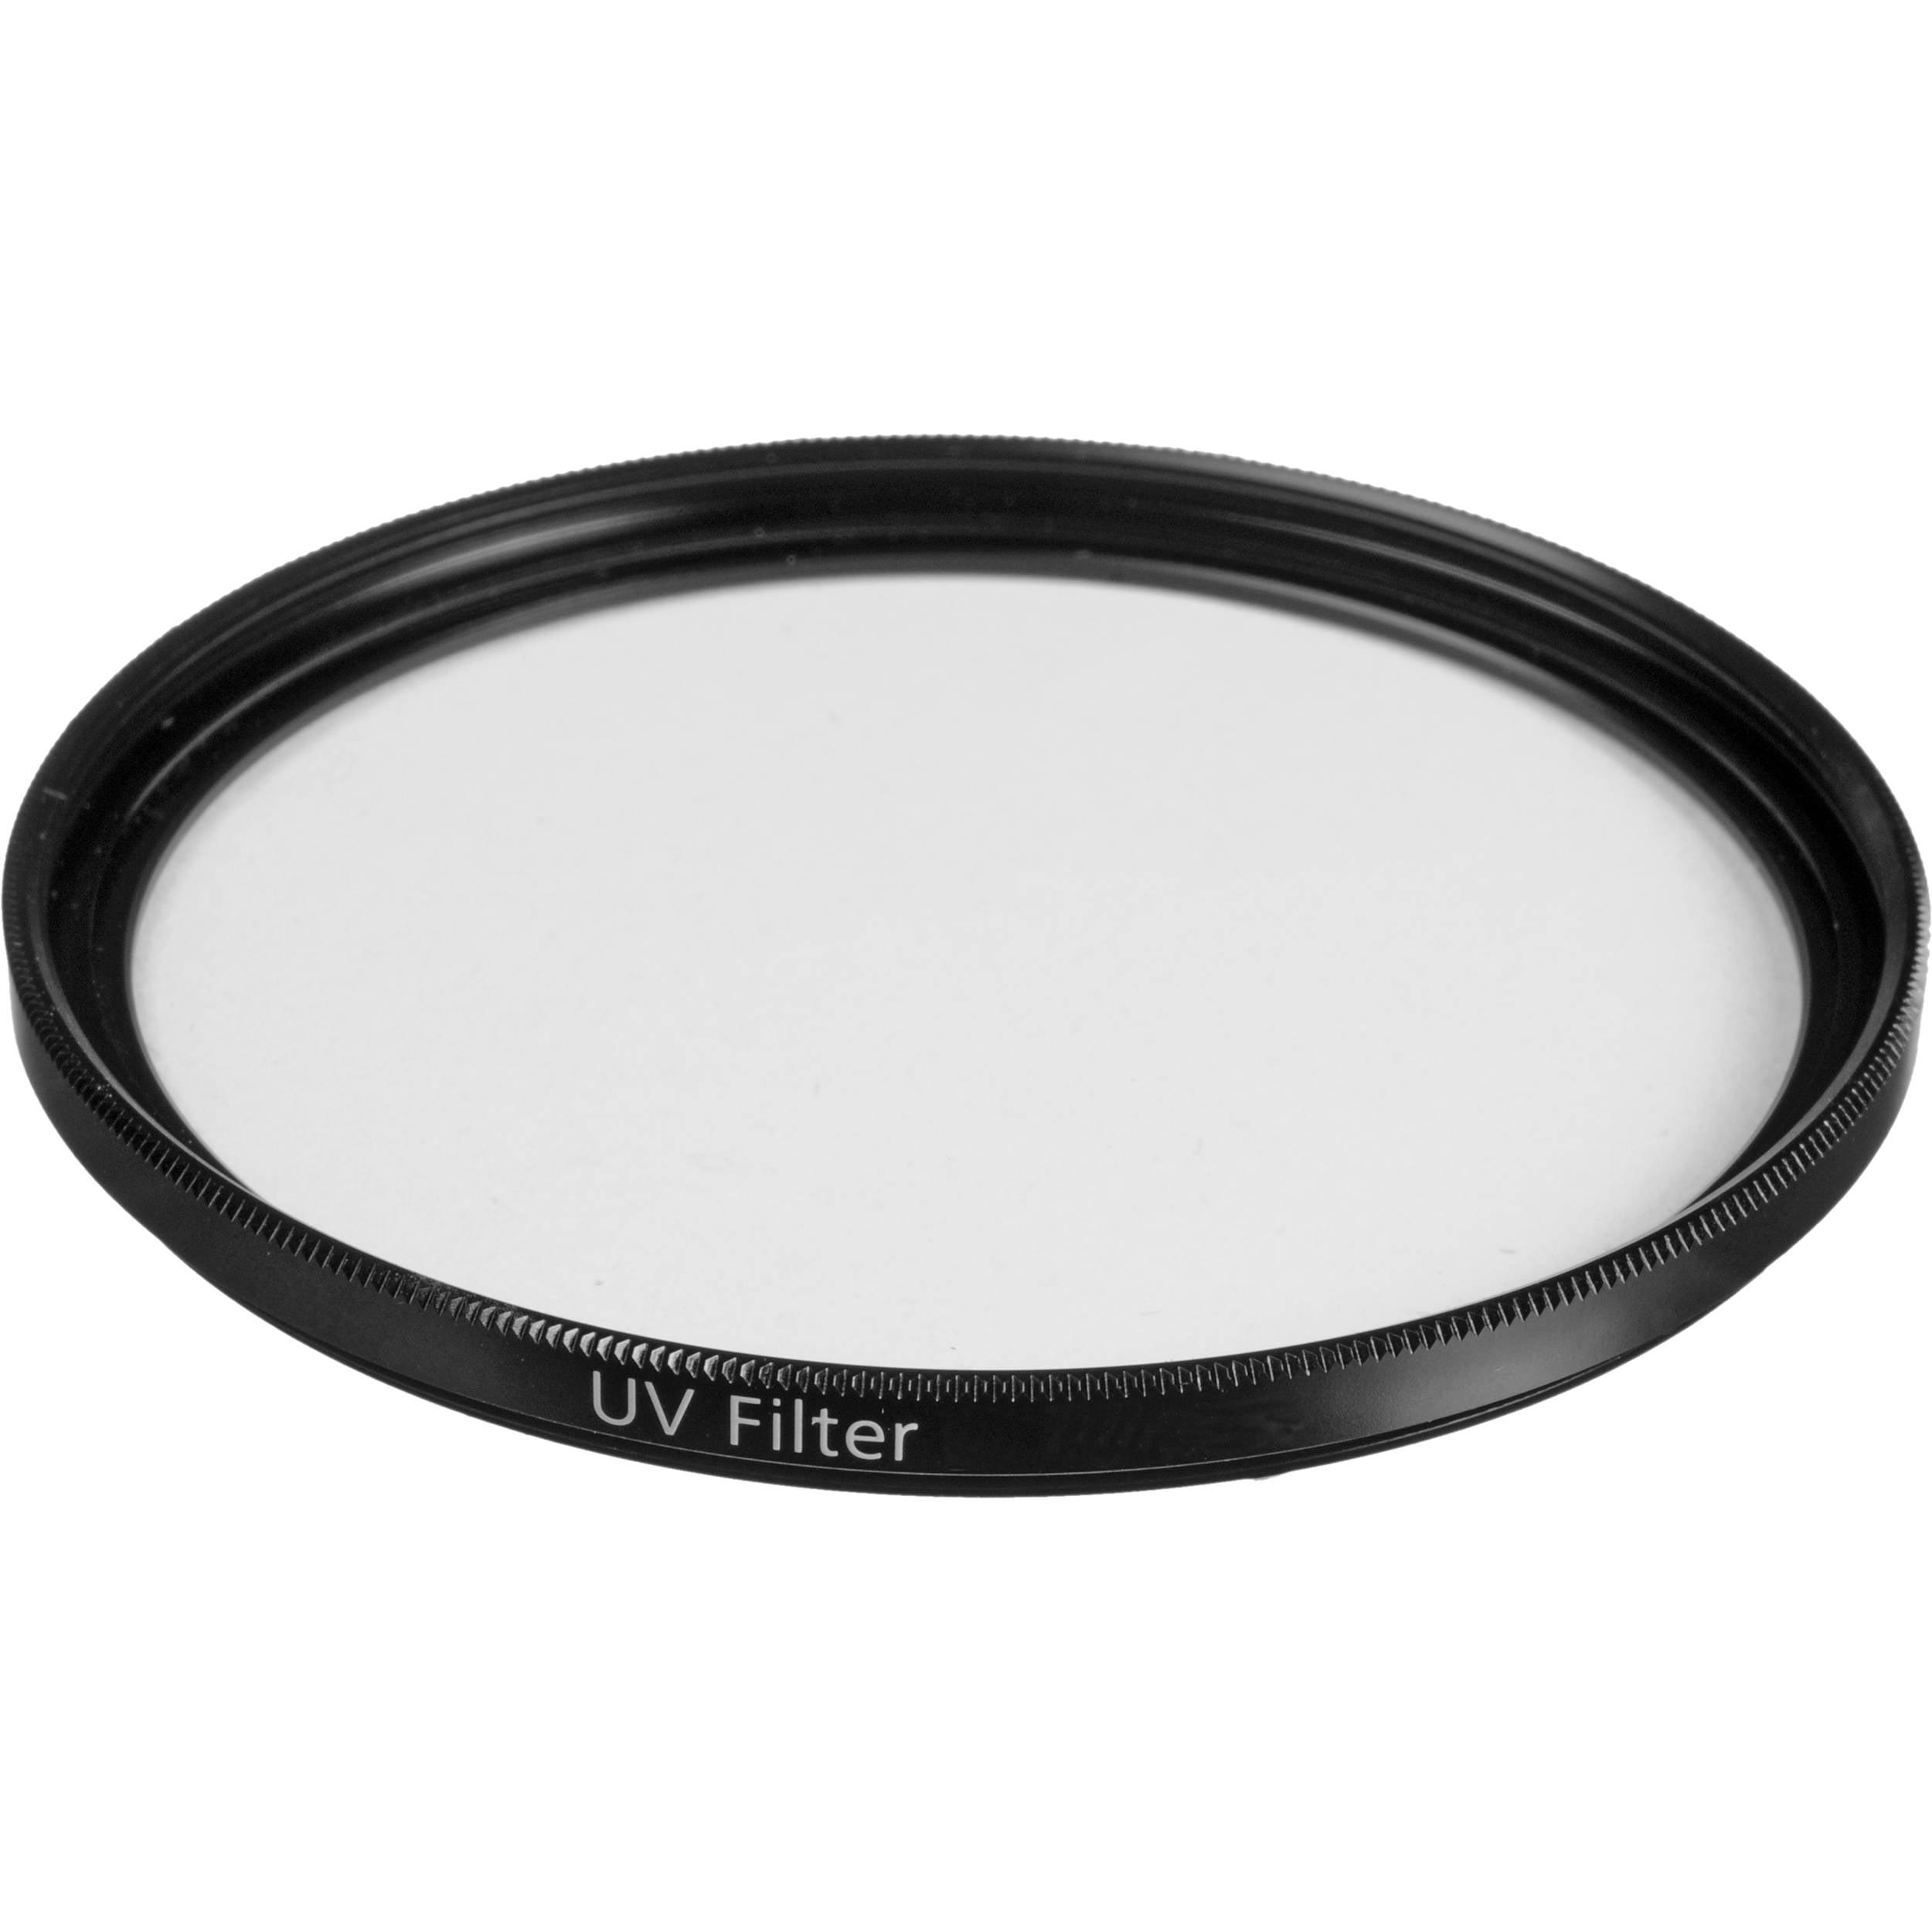 Ultraviolet Protection Filter for Rokinon 85mm F//1.4 Aspherical Lens 72mm UV